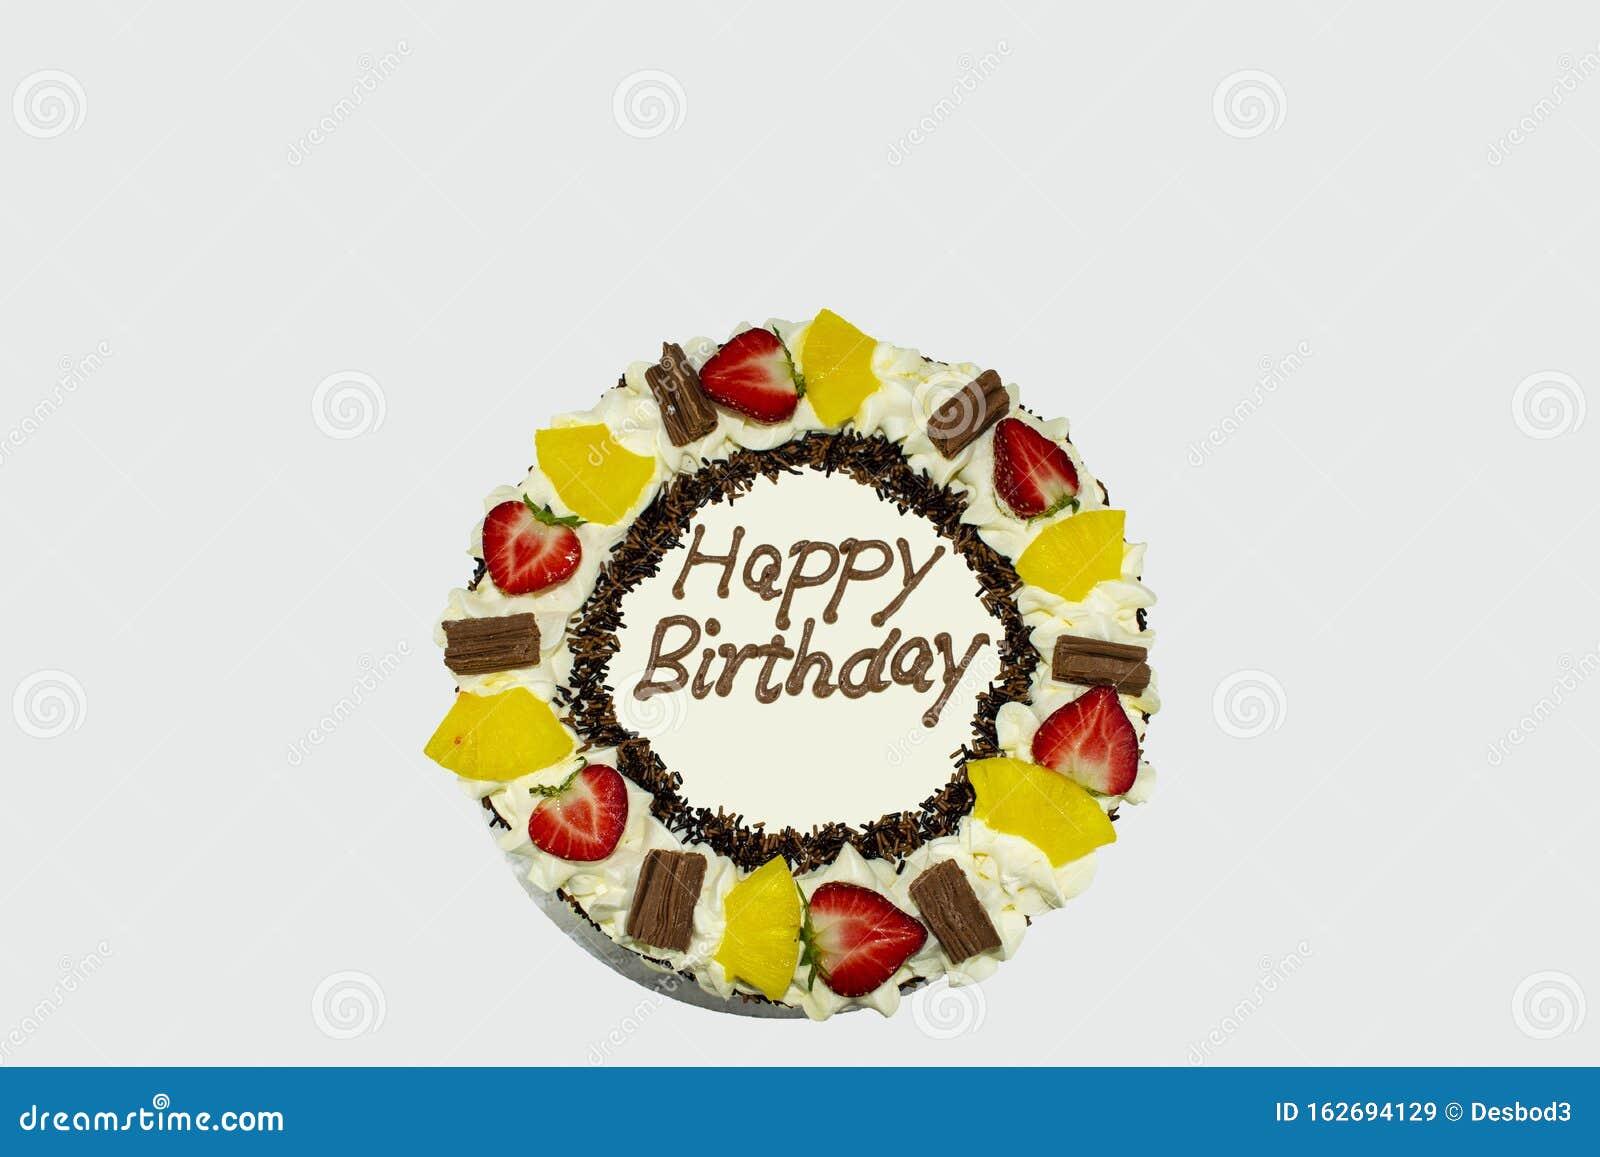 Excellent Happy Birthday Cake Stock Image Image Of Celebration 162694129 Birthday Cards Printable Riciscafe Filternl